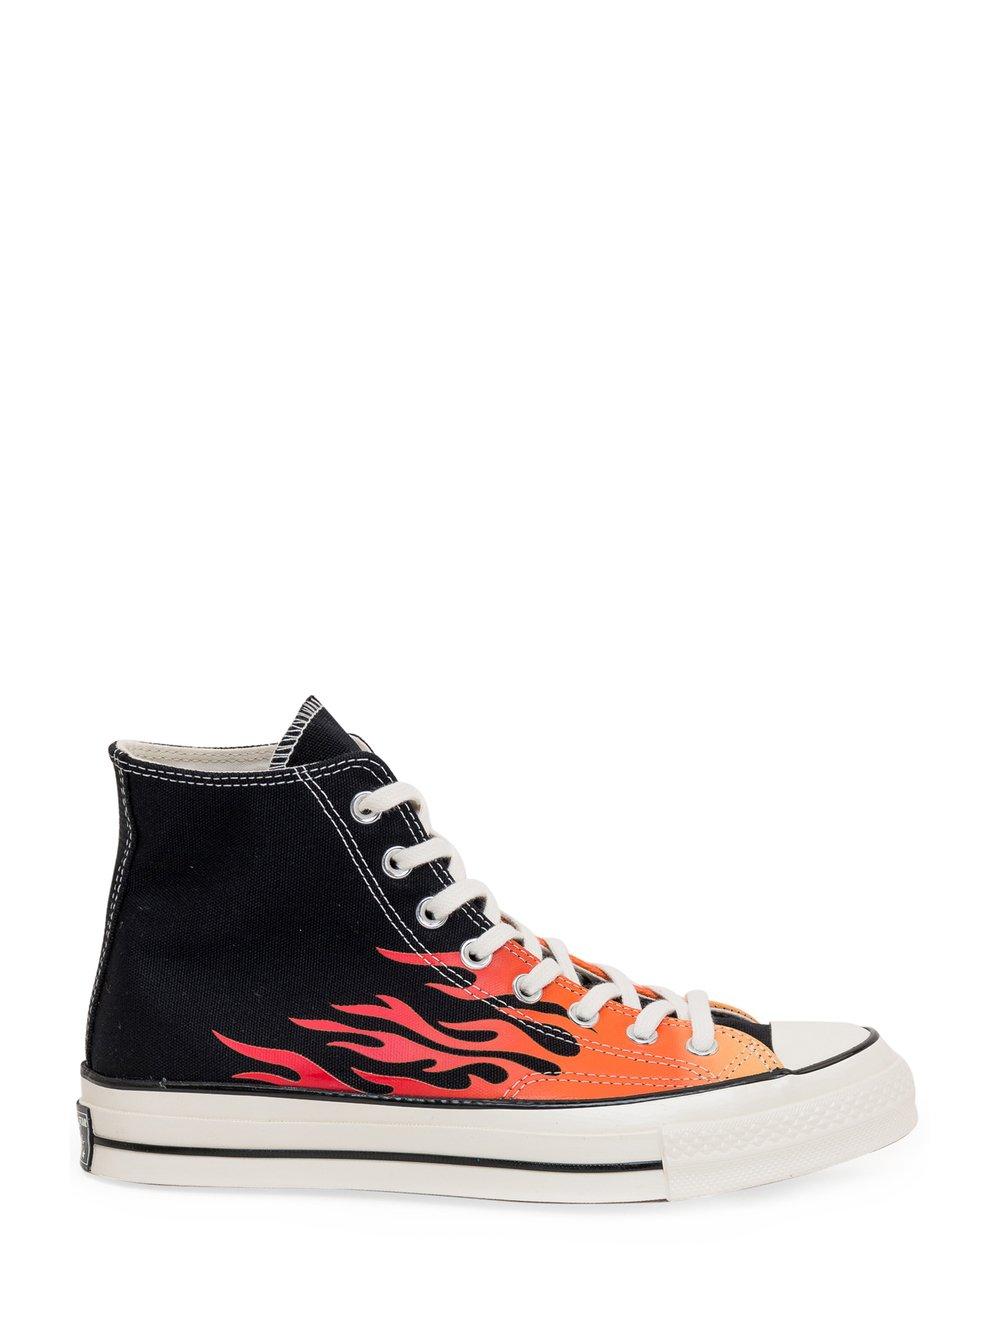 converse scarpe donna state